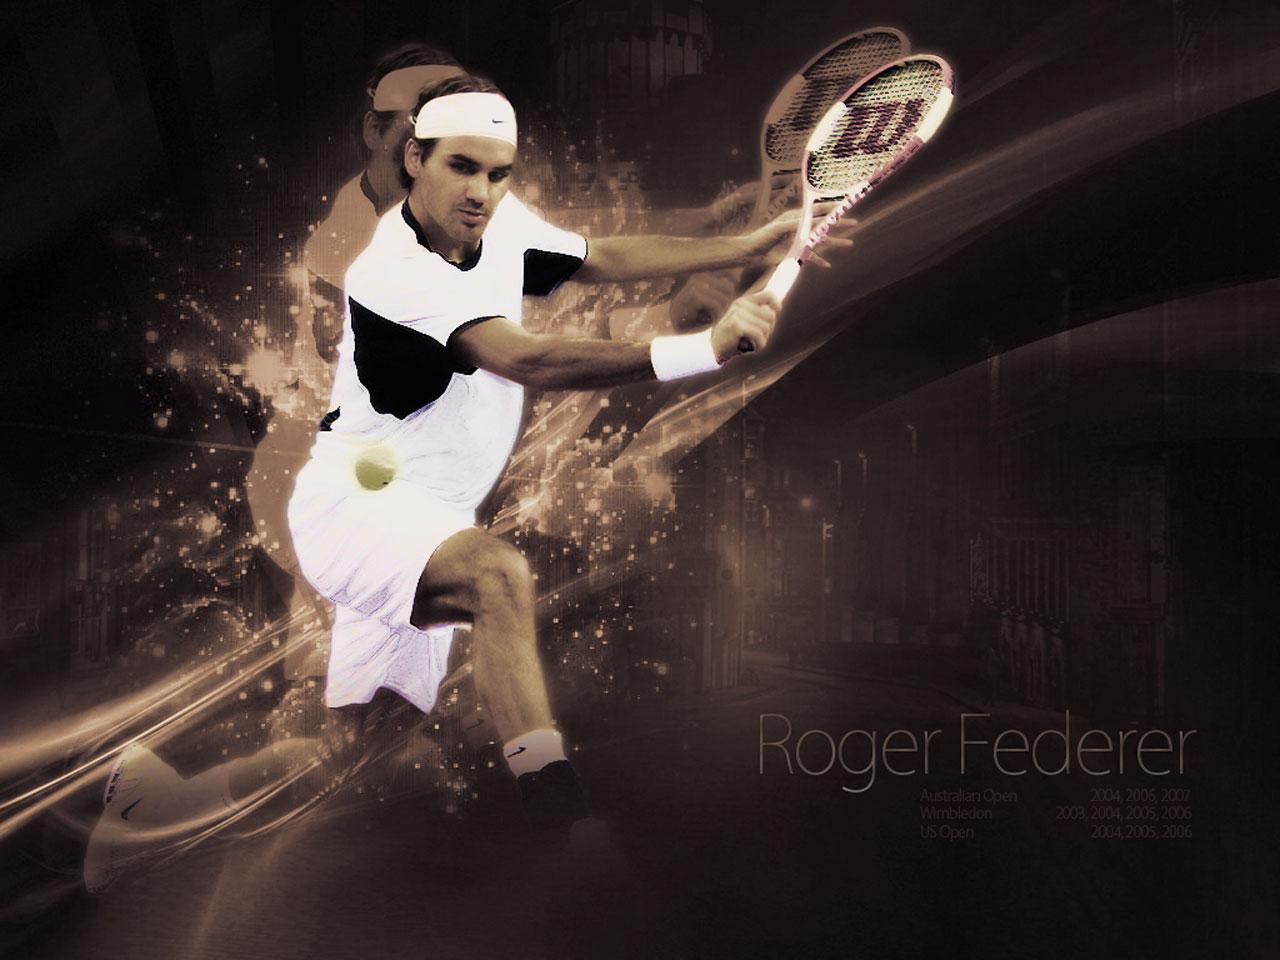 Roger Federer HD Wallpapers 2012 | Tennis Stars